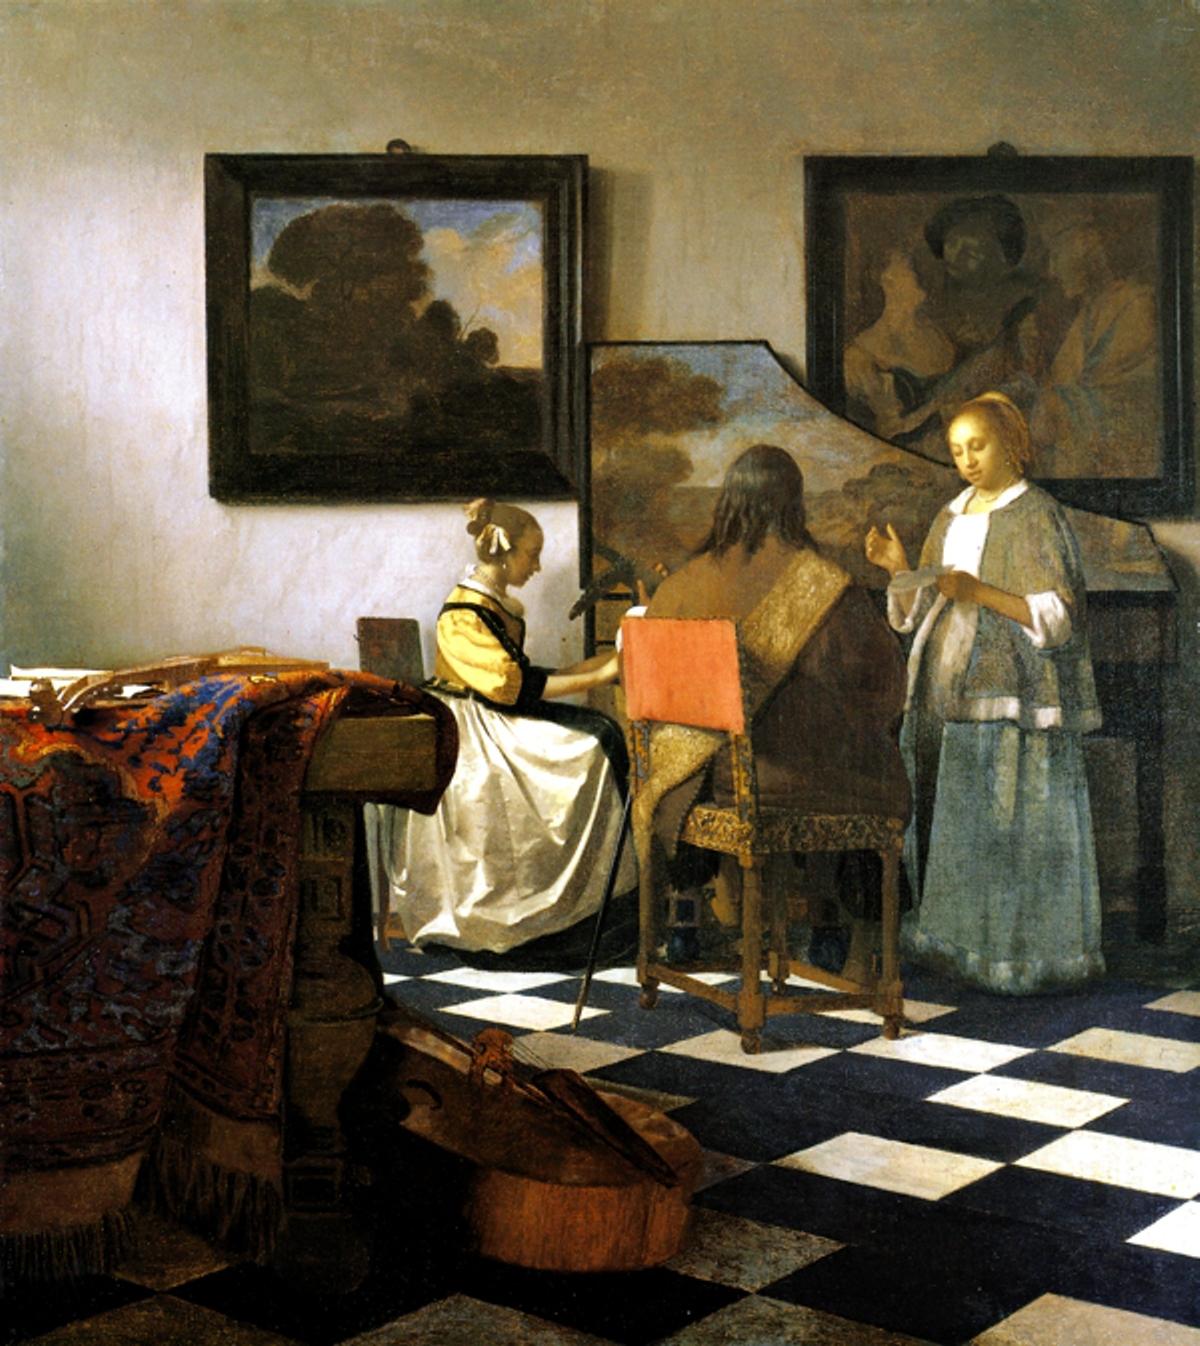 https-::www.libertypuzzles.com:userfiles:media:images:5132:vermeer-concert-image-1300.jpg